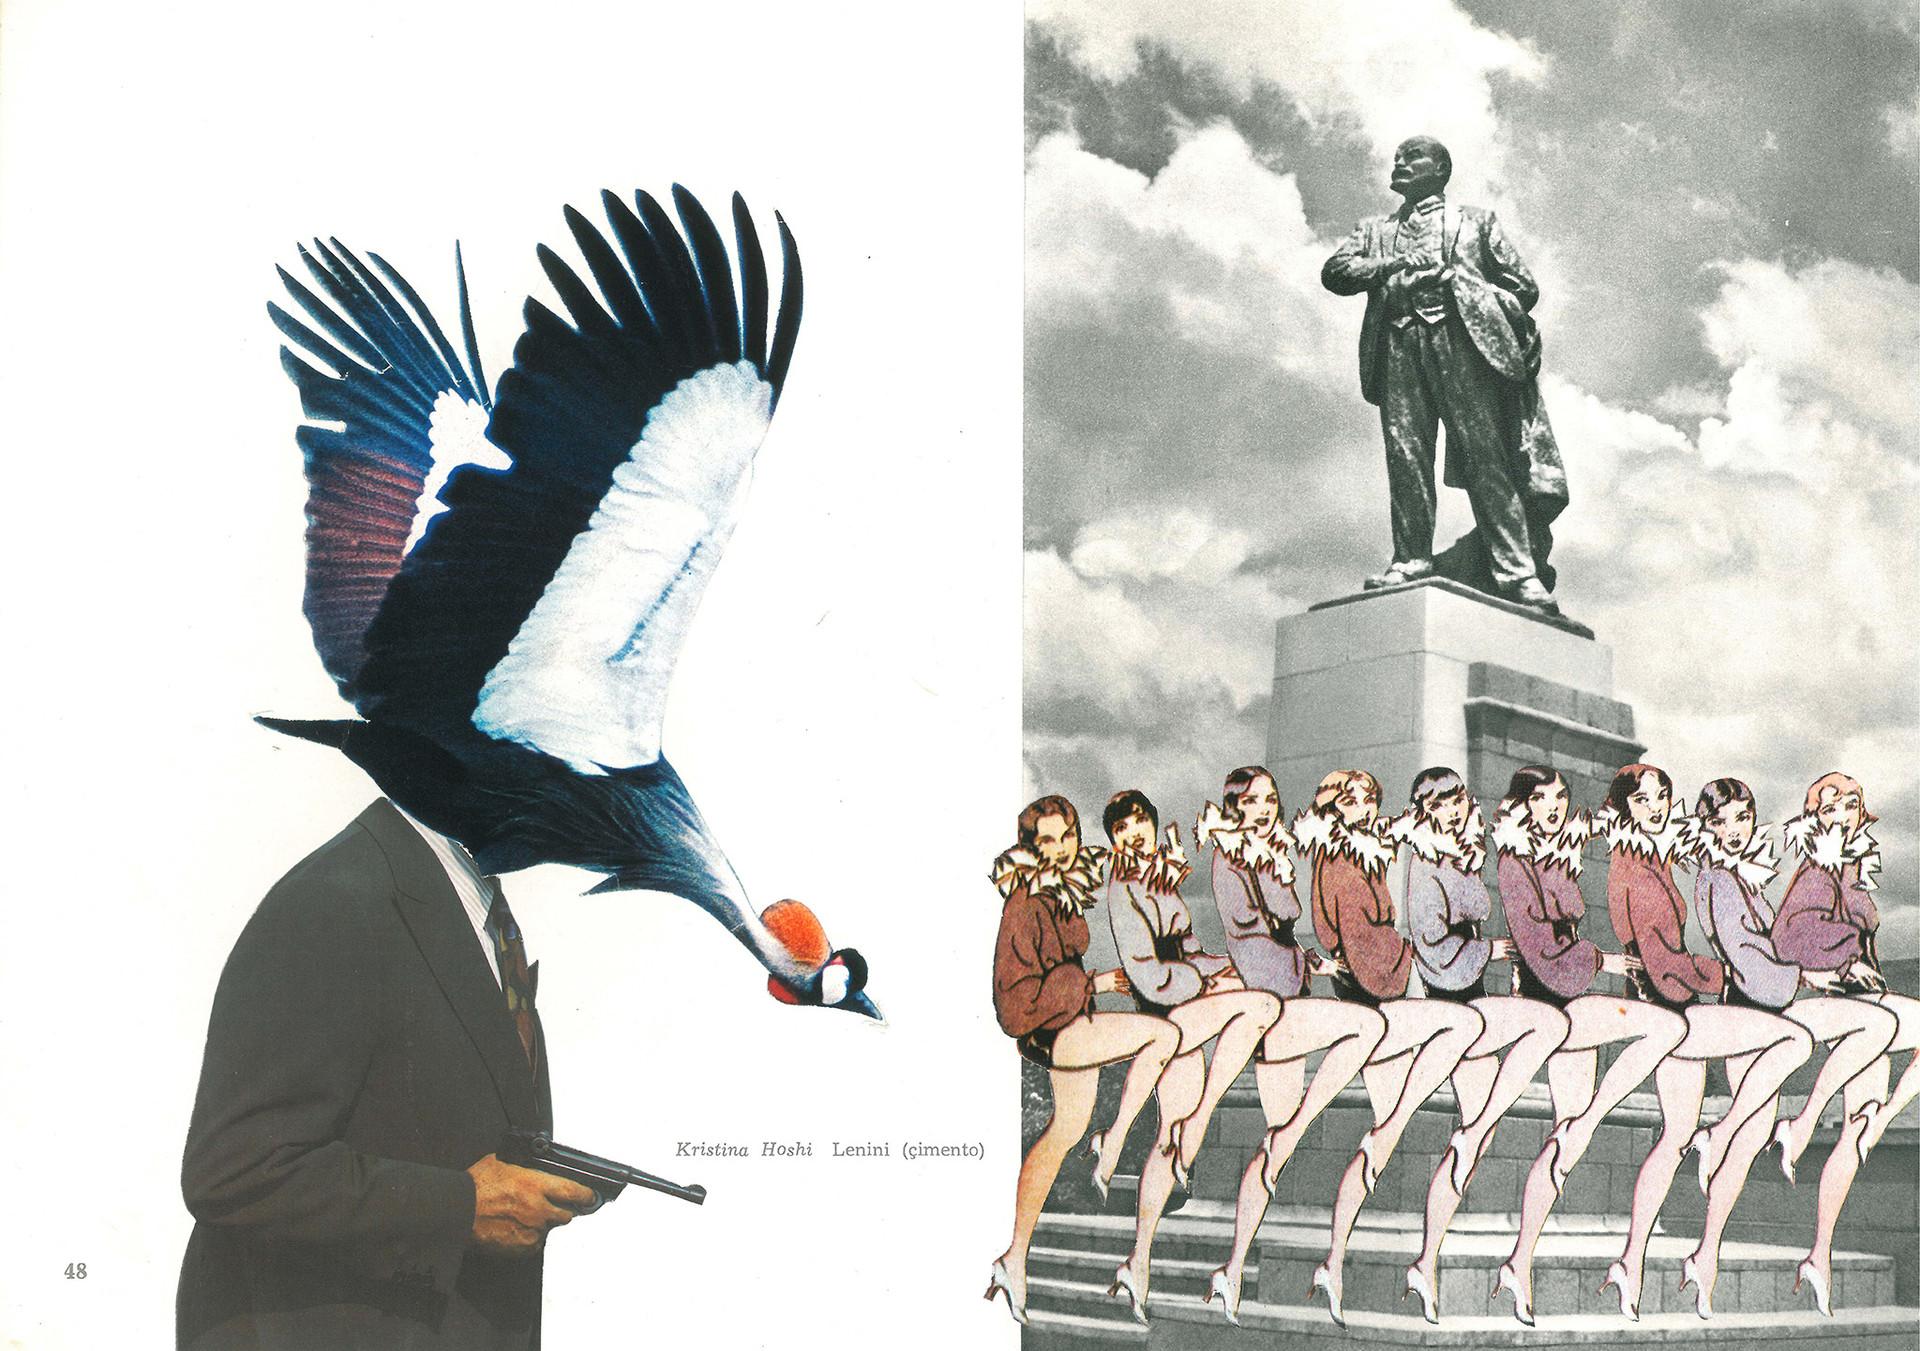 Lenin's party